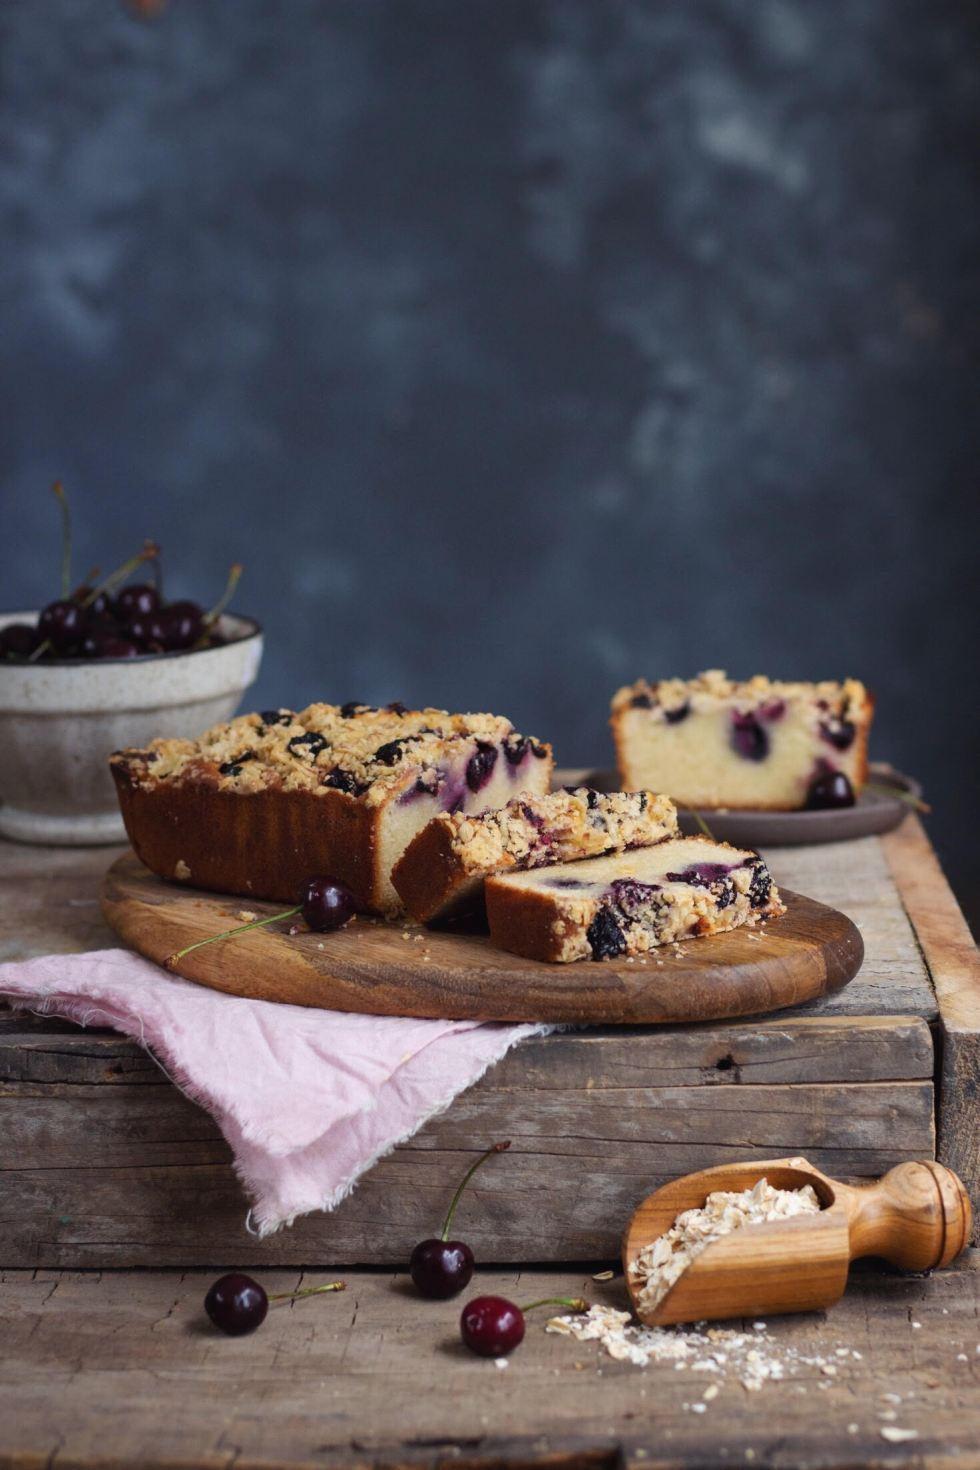 CHERRY-VANILLA LOAF CAKE